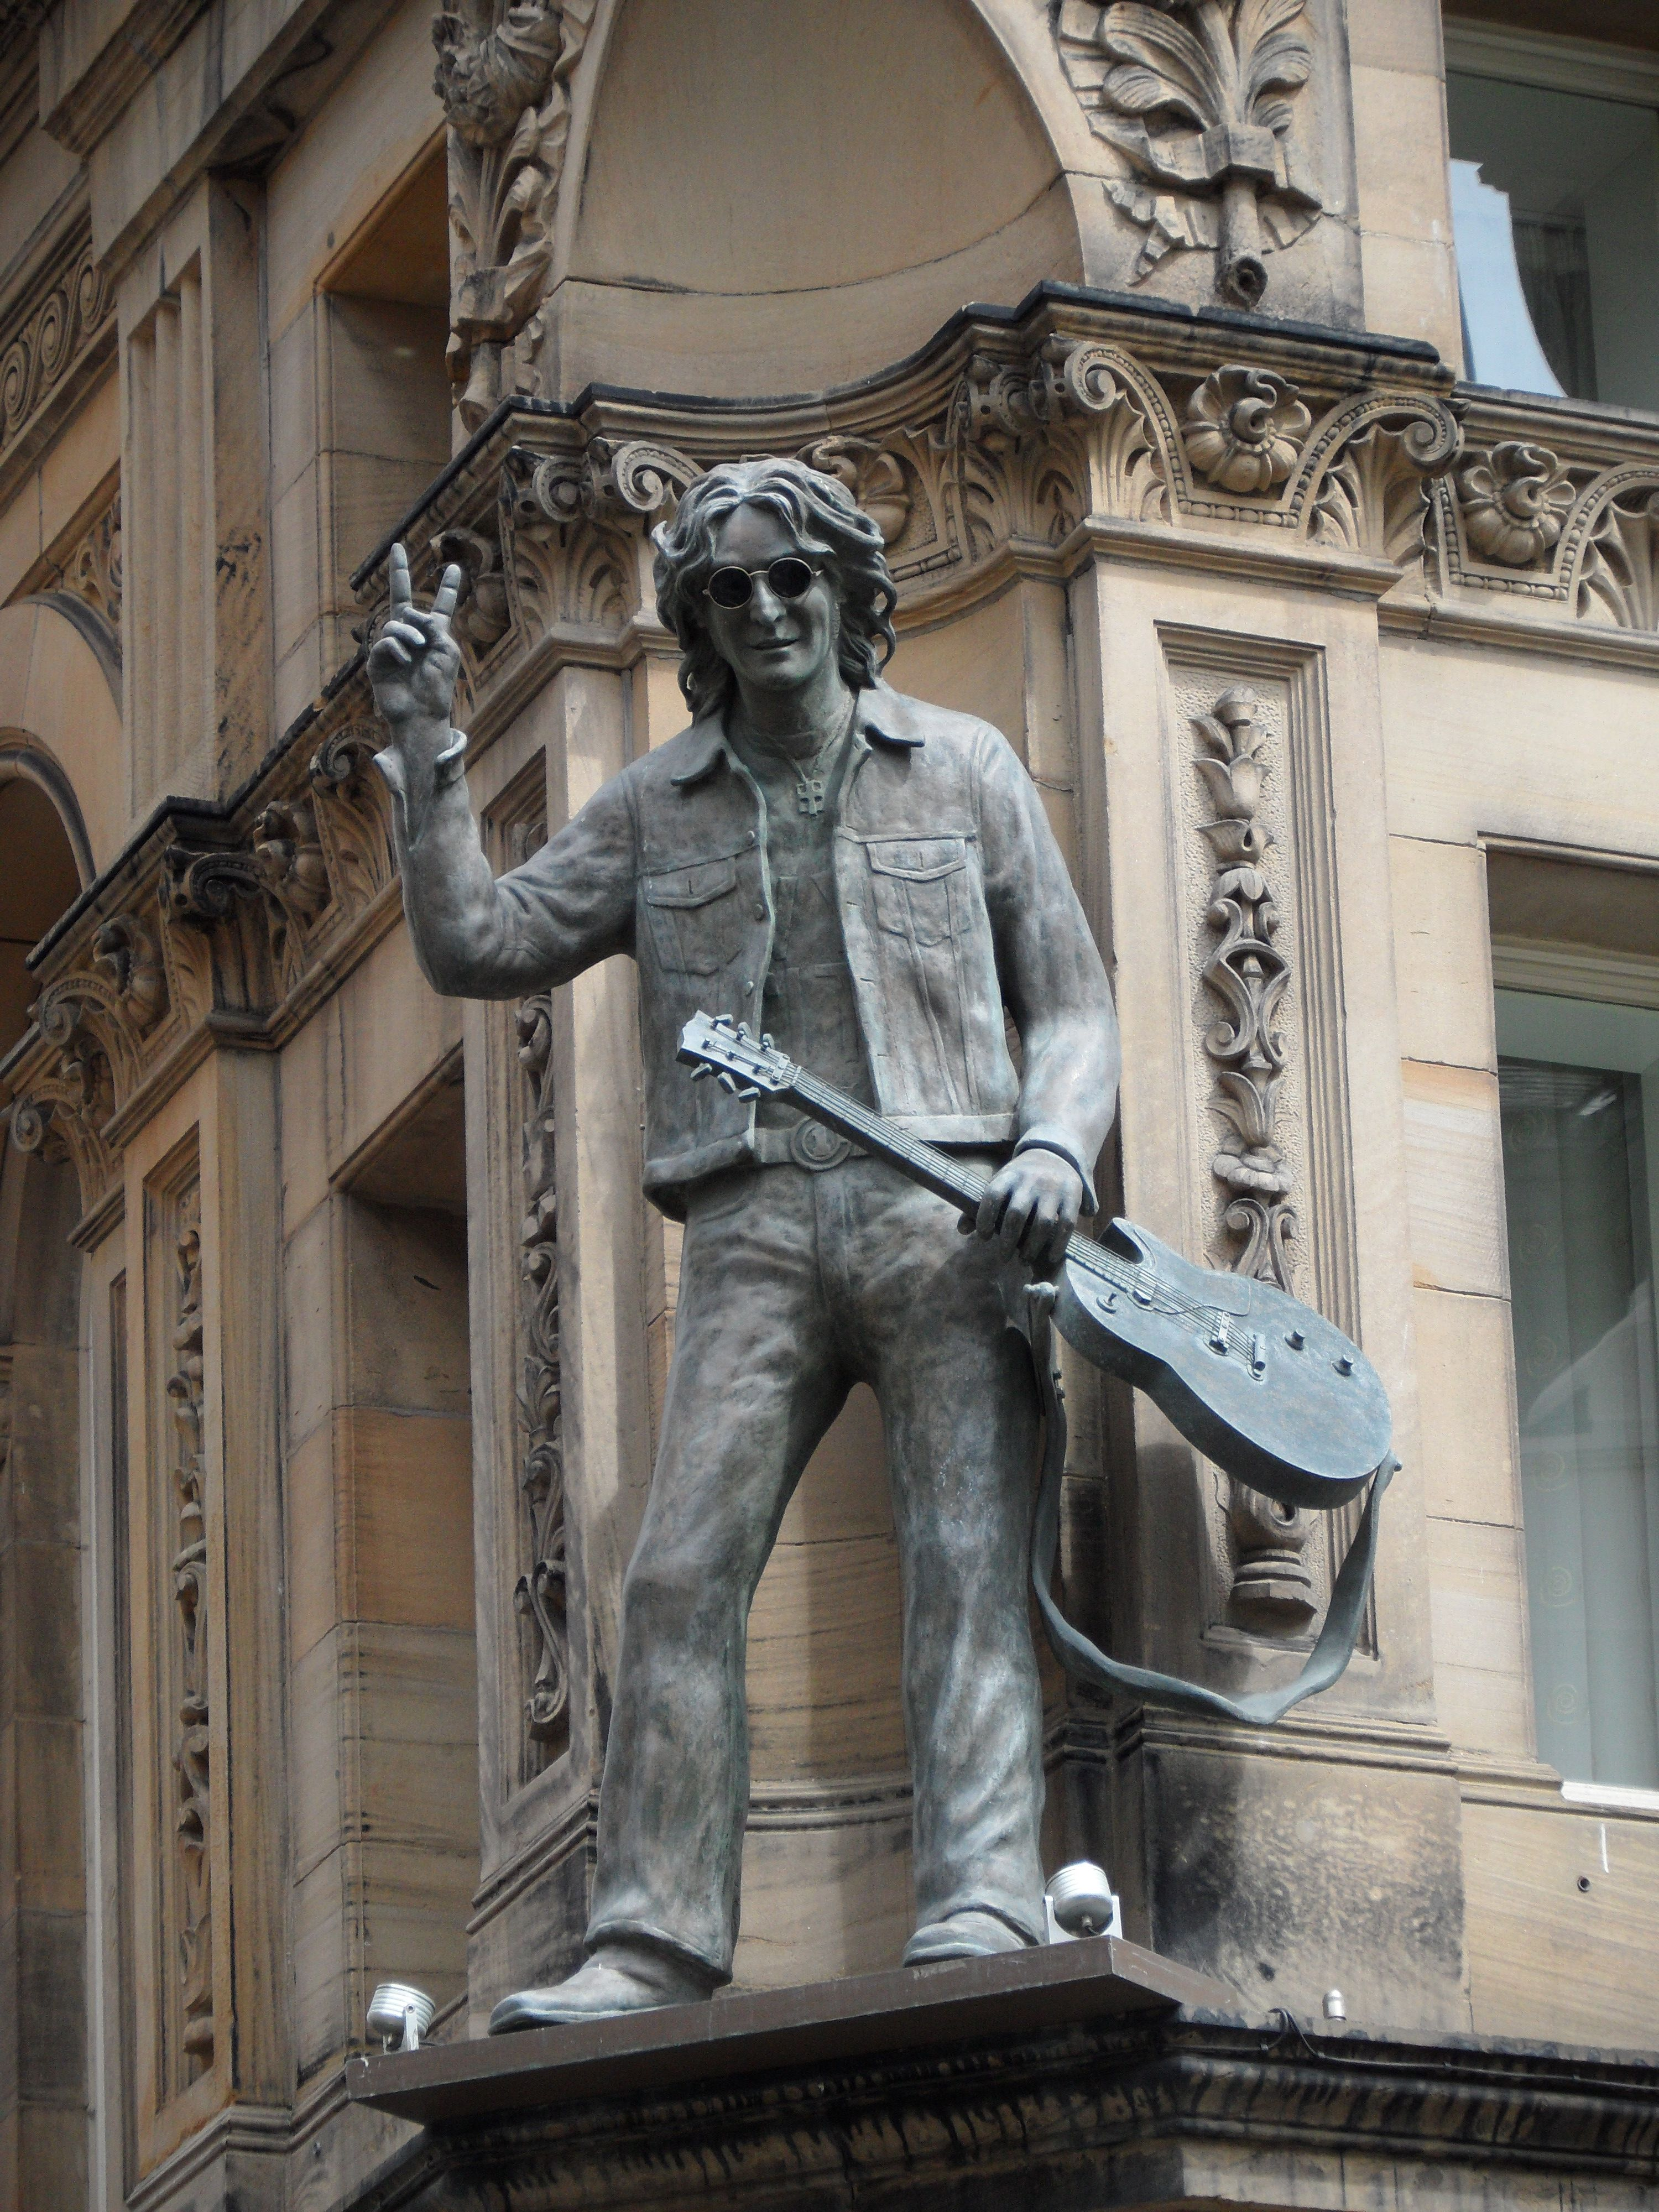 John Lennon Statue Hard Days Night Hotel Liverpool